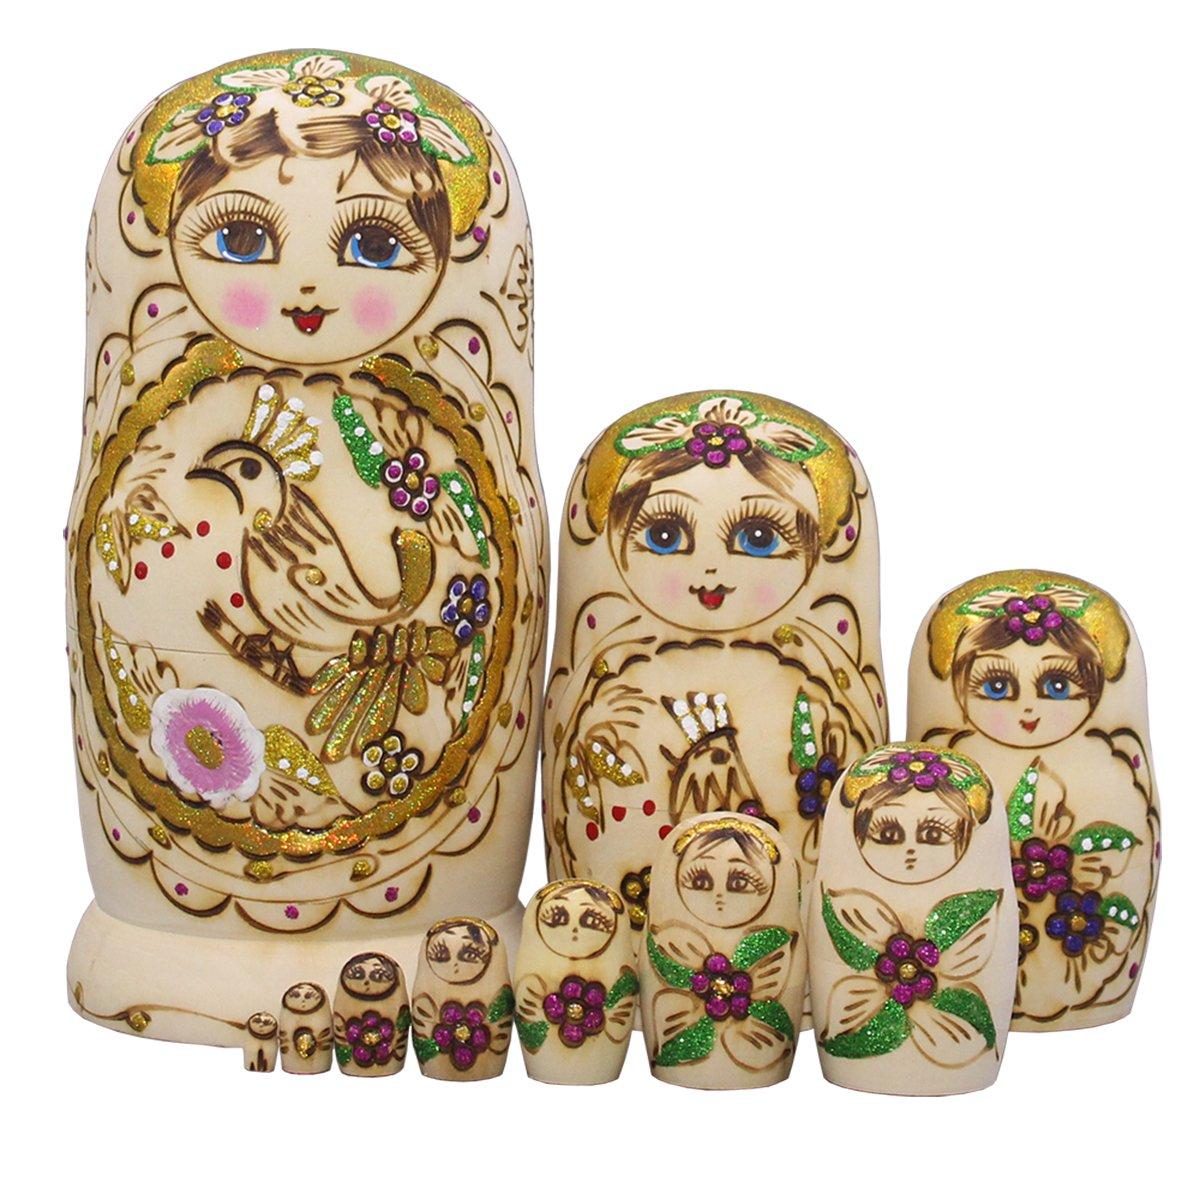 Moonmo 10pcs Beautiful Handmade Wooden Russia Nesting Dolls Gift Russian Nesting Wishing Dolls Red Flower Matryoshka Traditional.